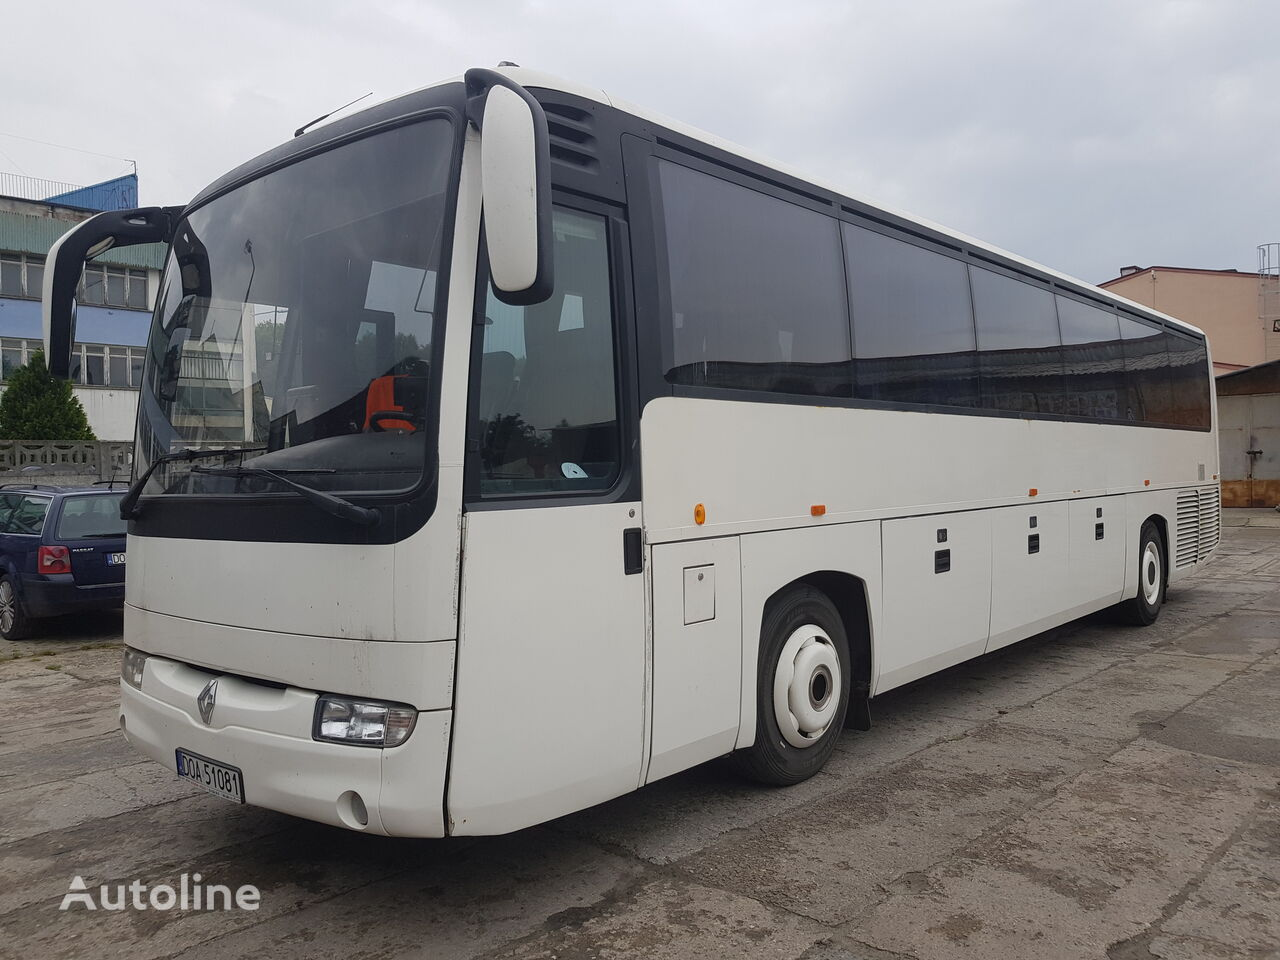 RENAULT SFR112 coach bus